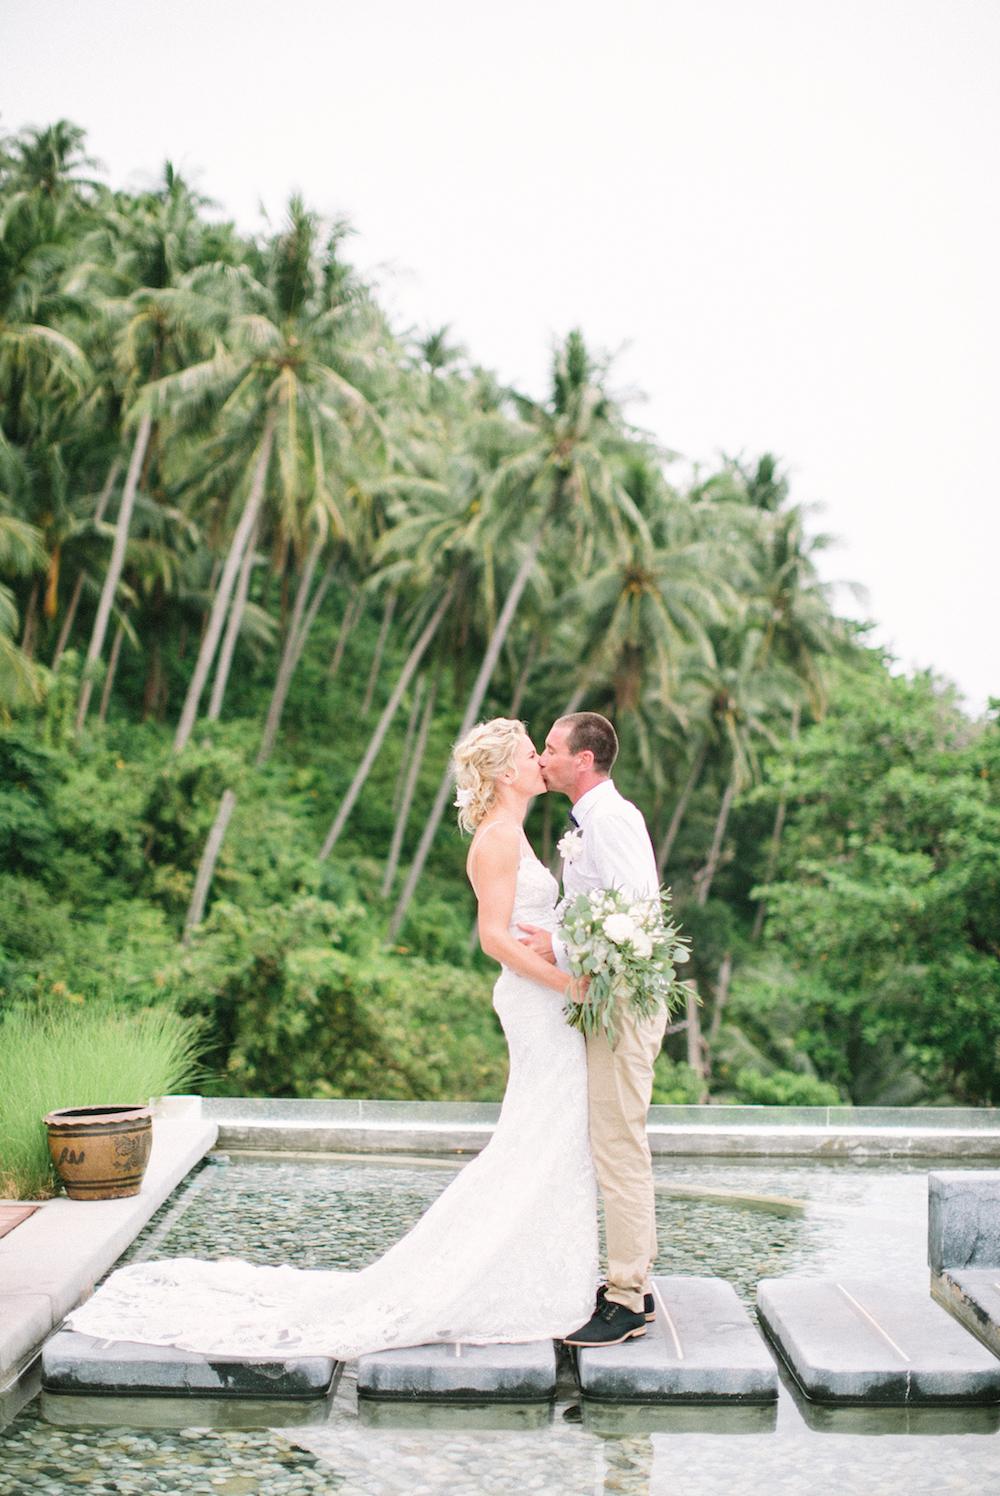 ©-saya-photography-studio-ohlala-wedding-photographer-photographe-mariage-the-naiharn-phuket-165.jpg